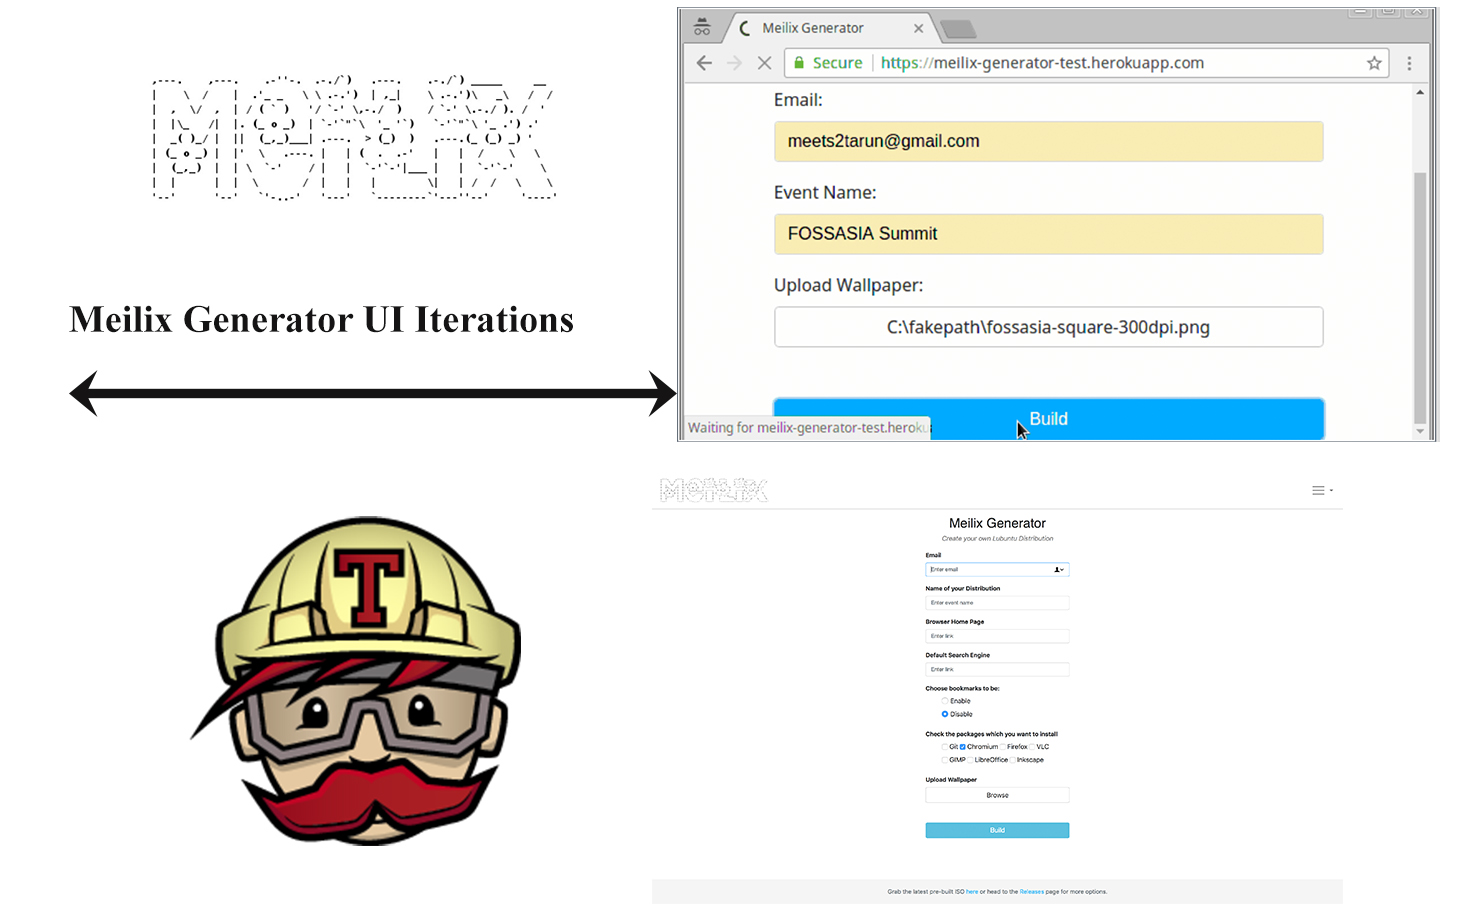 Implementation of Features in Generator UI